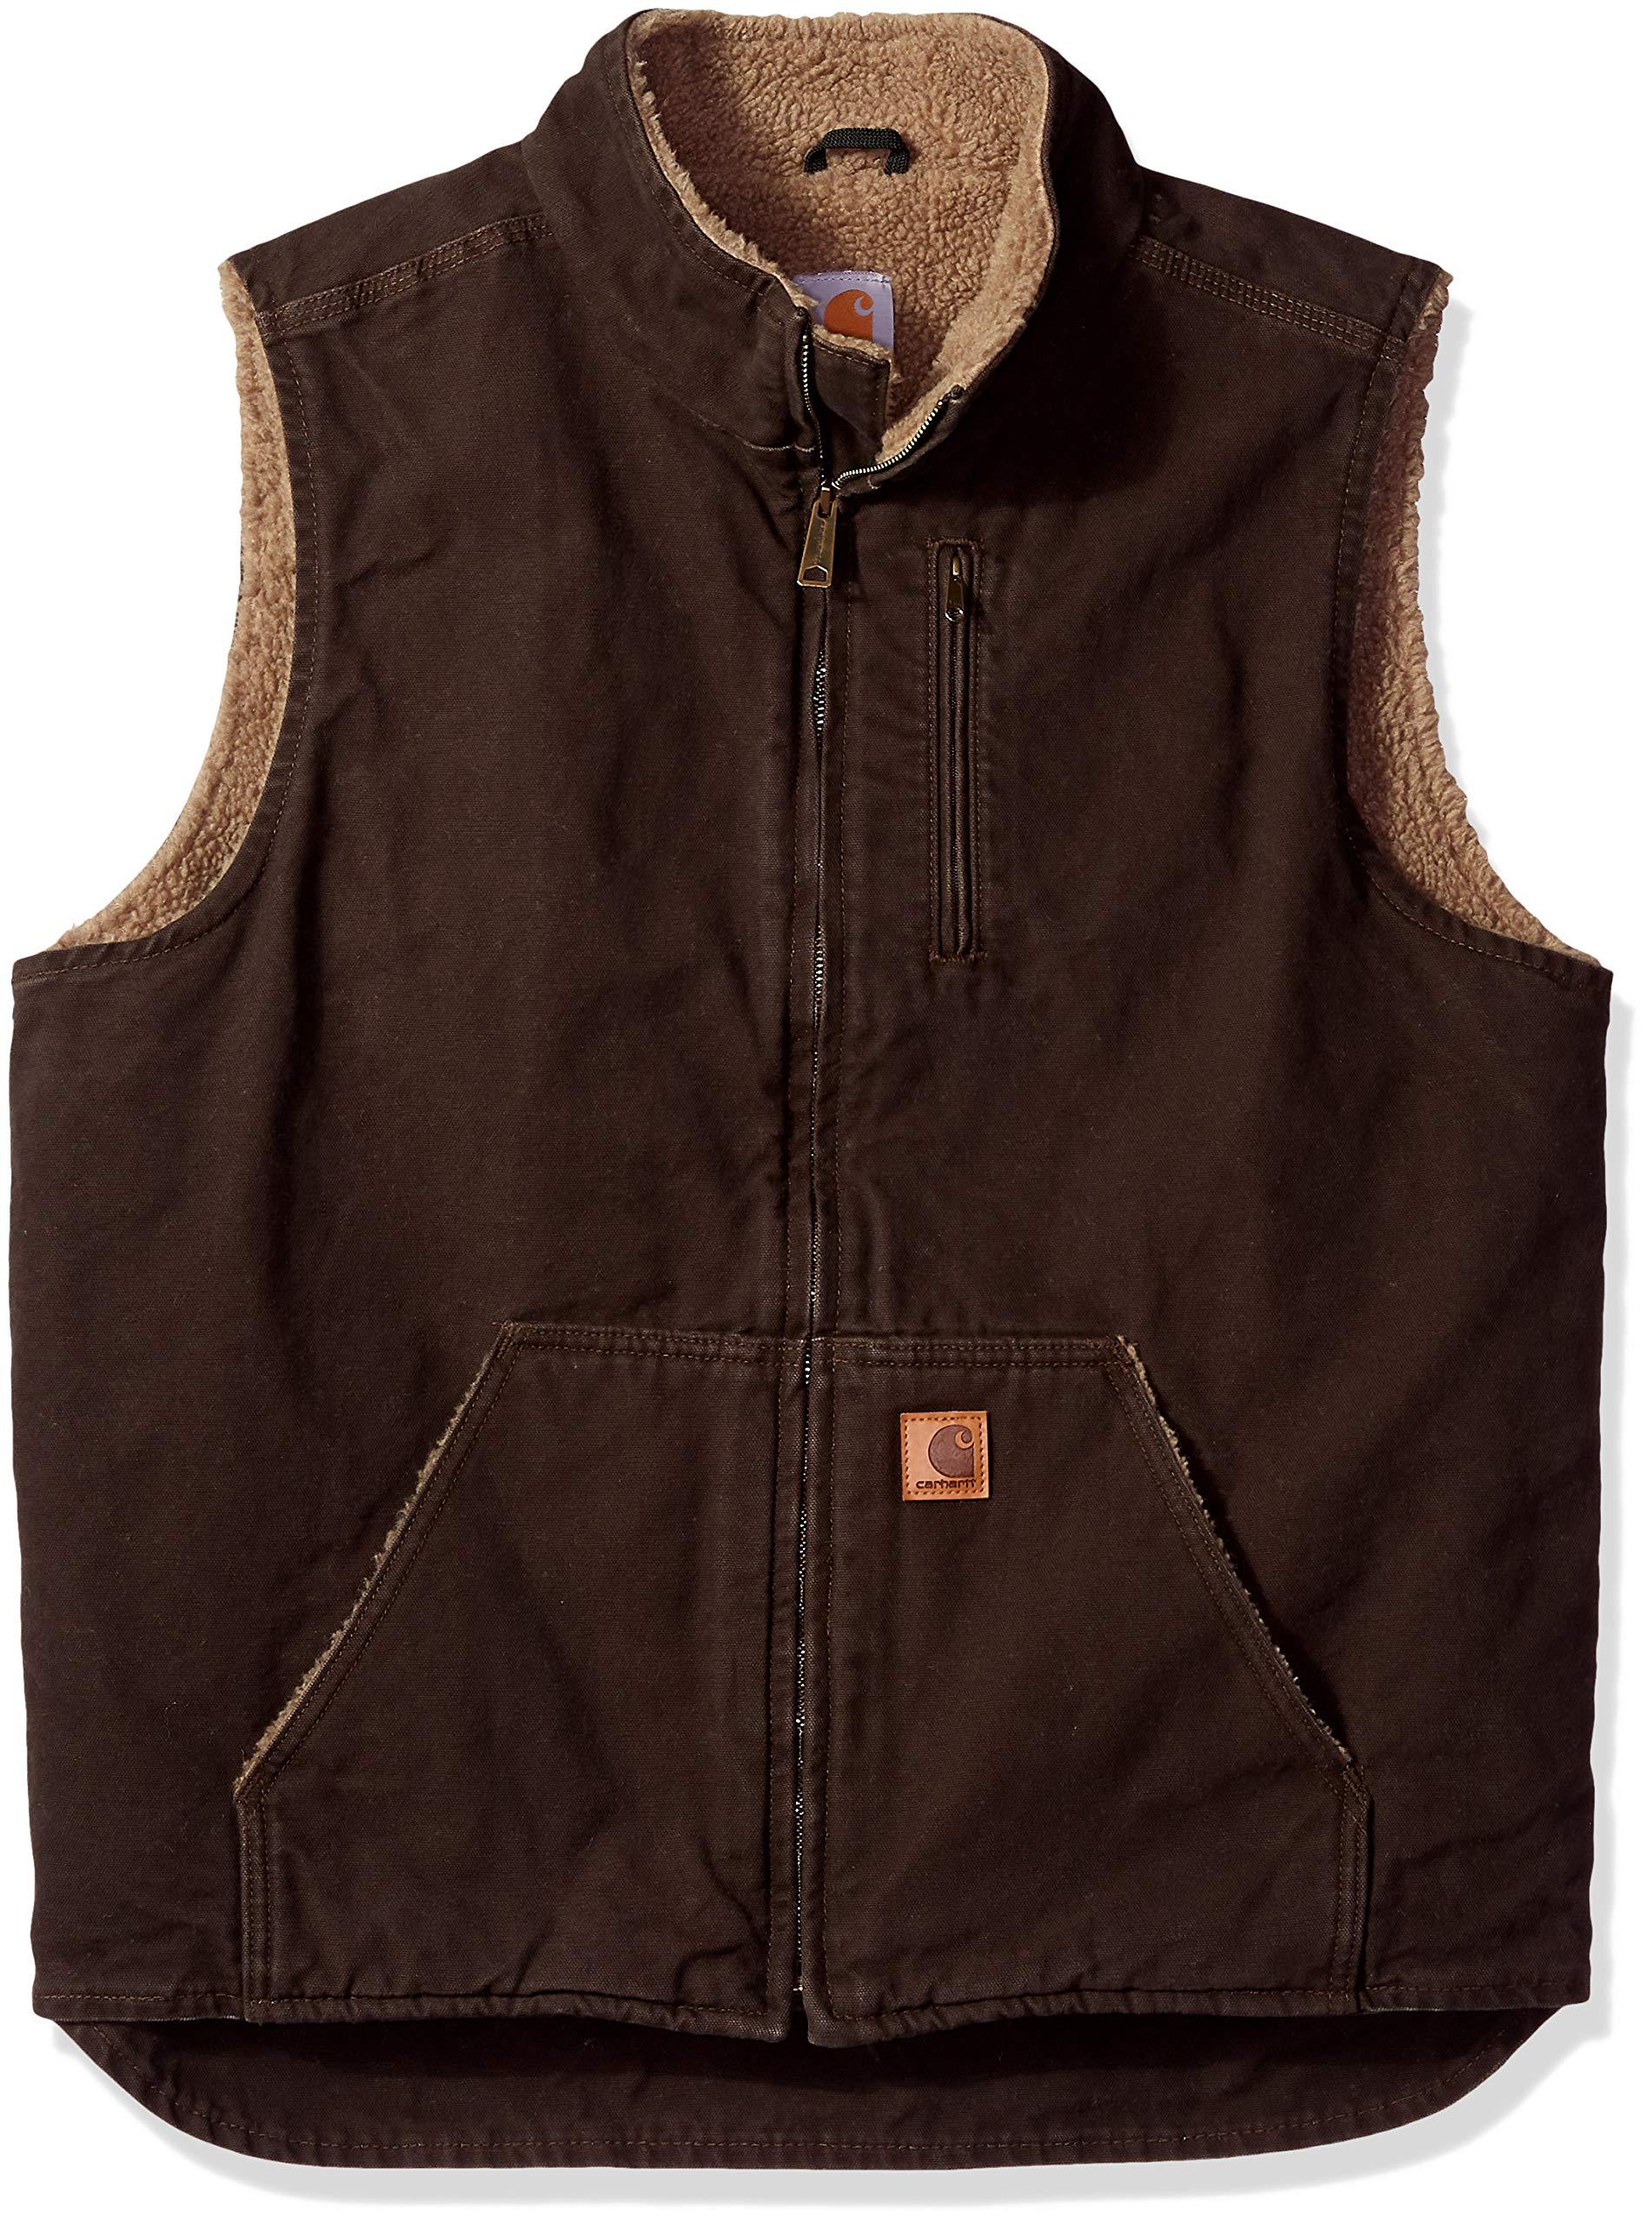 Carhartt Men's  Sherpa Lined  Mock Neck Vest ,Dark Brown,X-Large/Tall by Carhartt